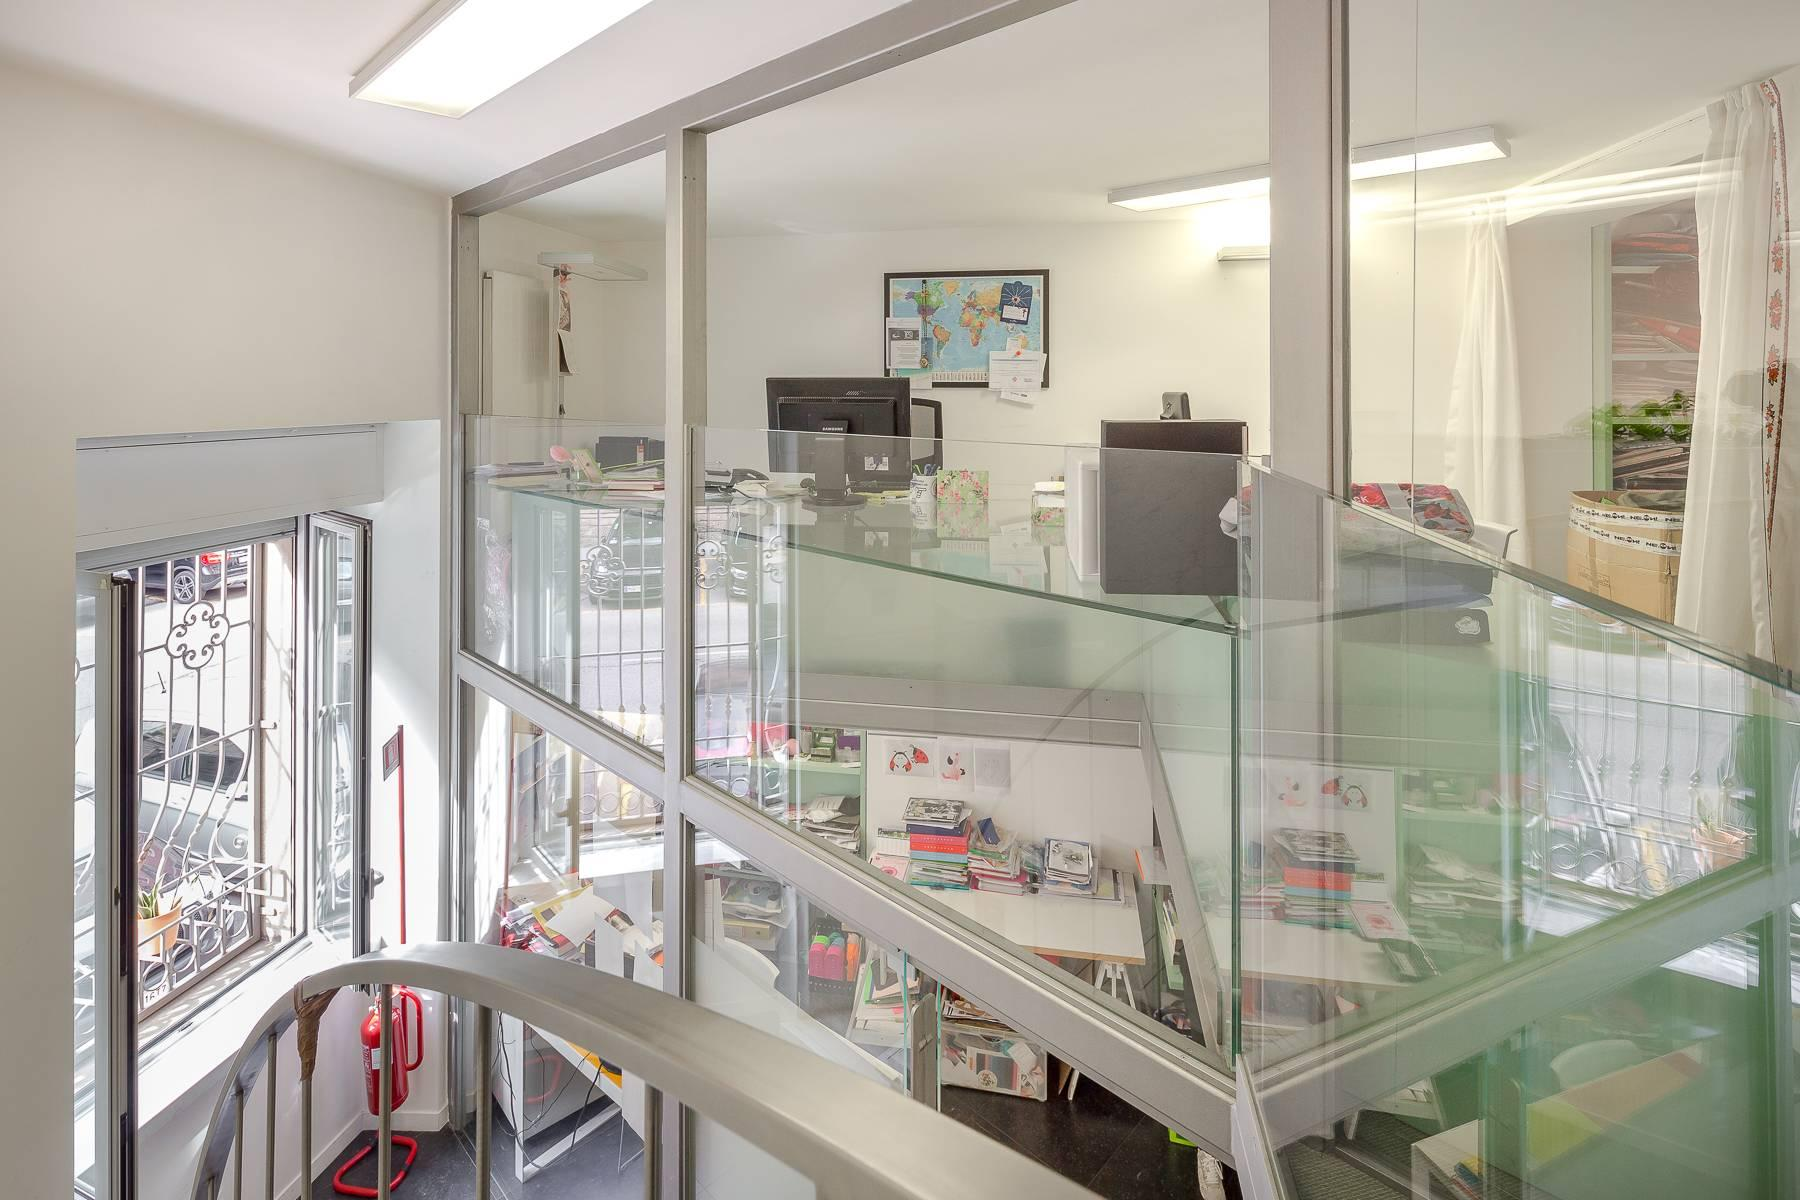 Opne-Space Büro / Wohnimmobilie auf der Piazza Giovine Italia / Via Aurelio Saffi - 17